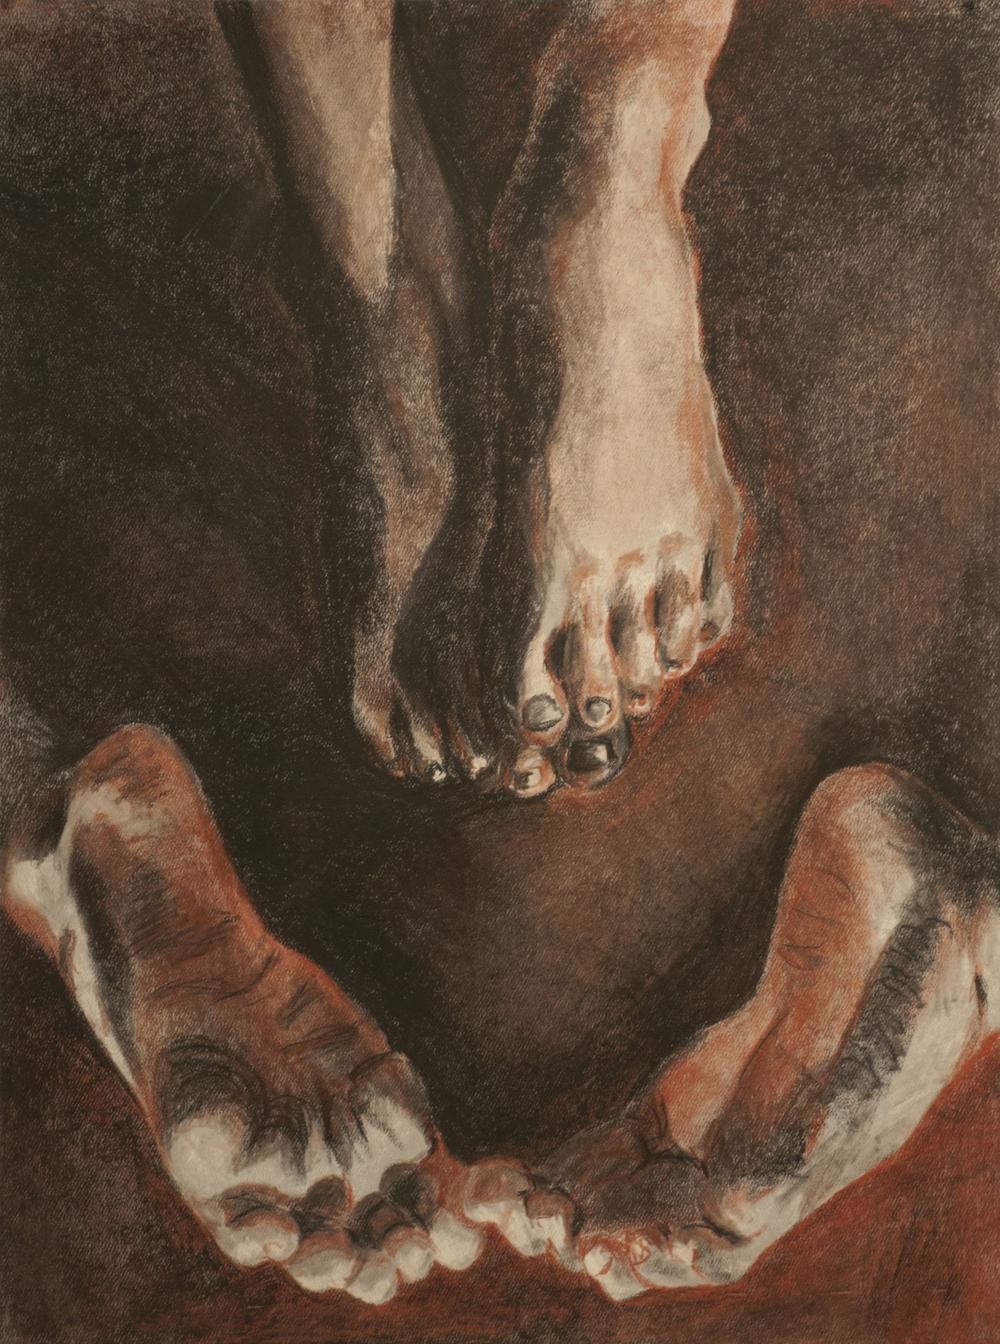 """Untitled (a study on feet)"""